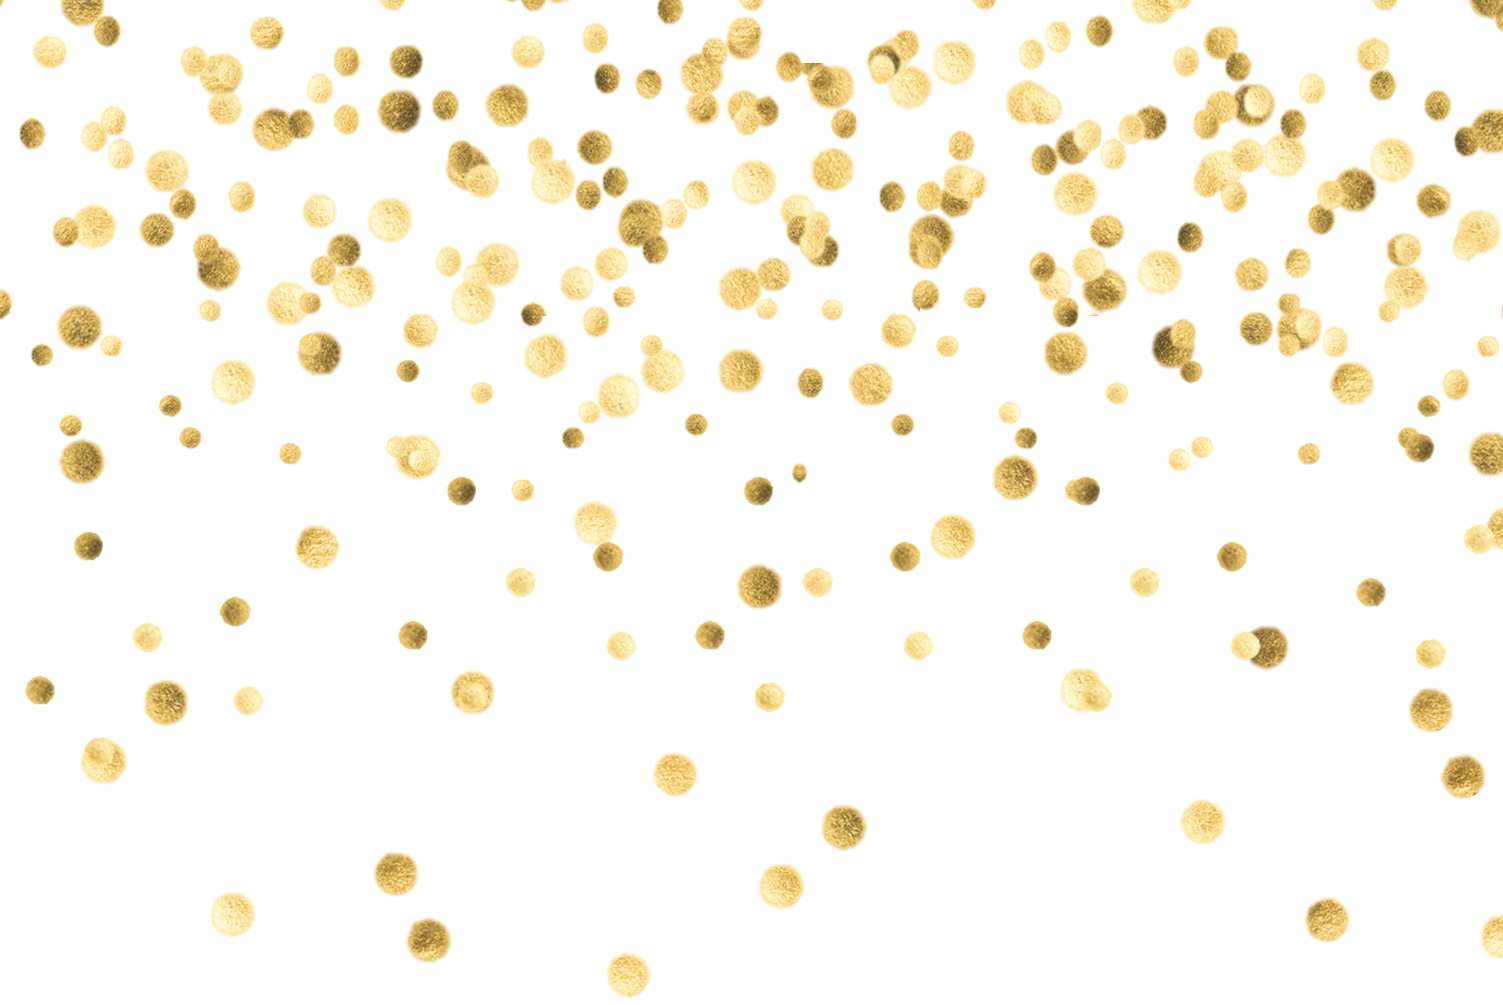 Image result for transparent. Gold confetti border png